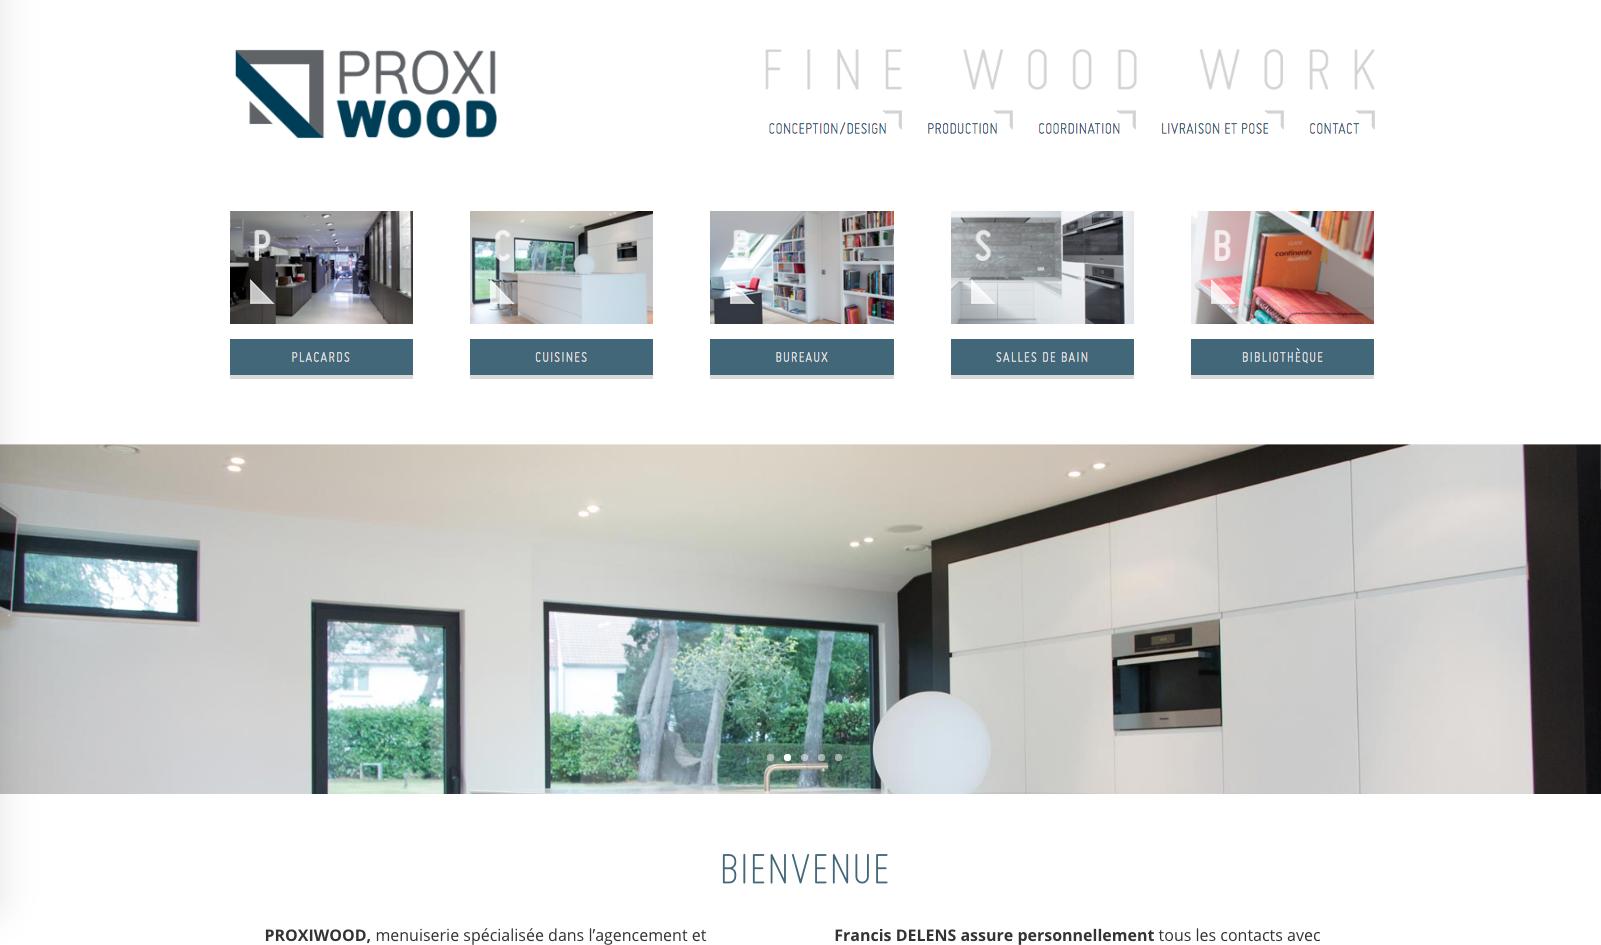 Proxiwood avant refonte (Wordpress)